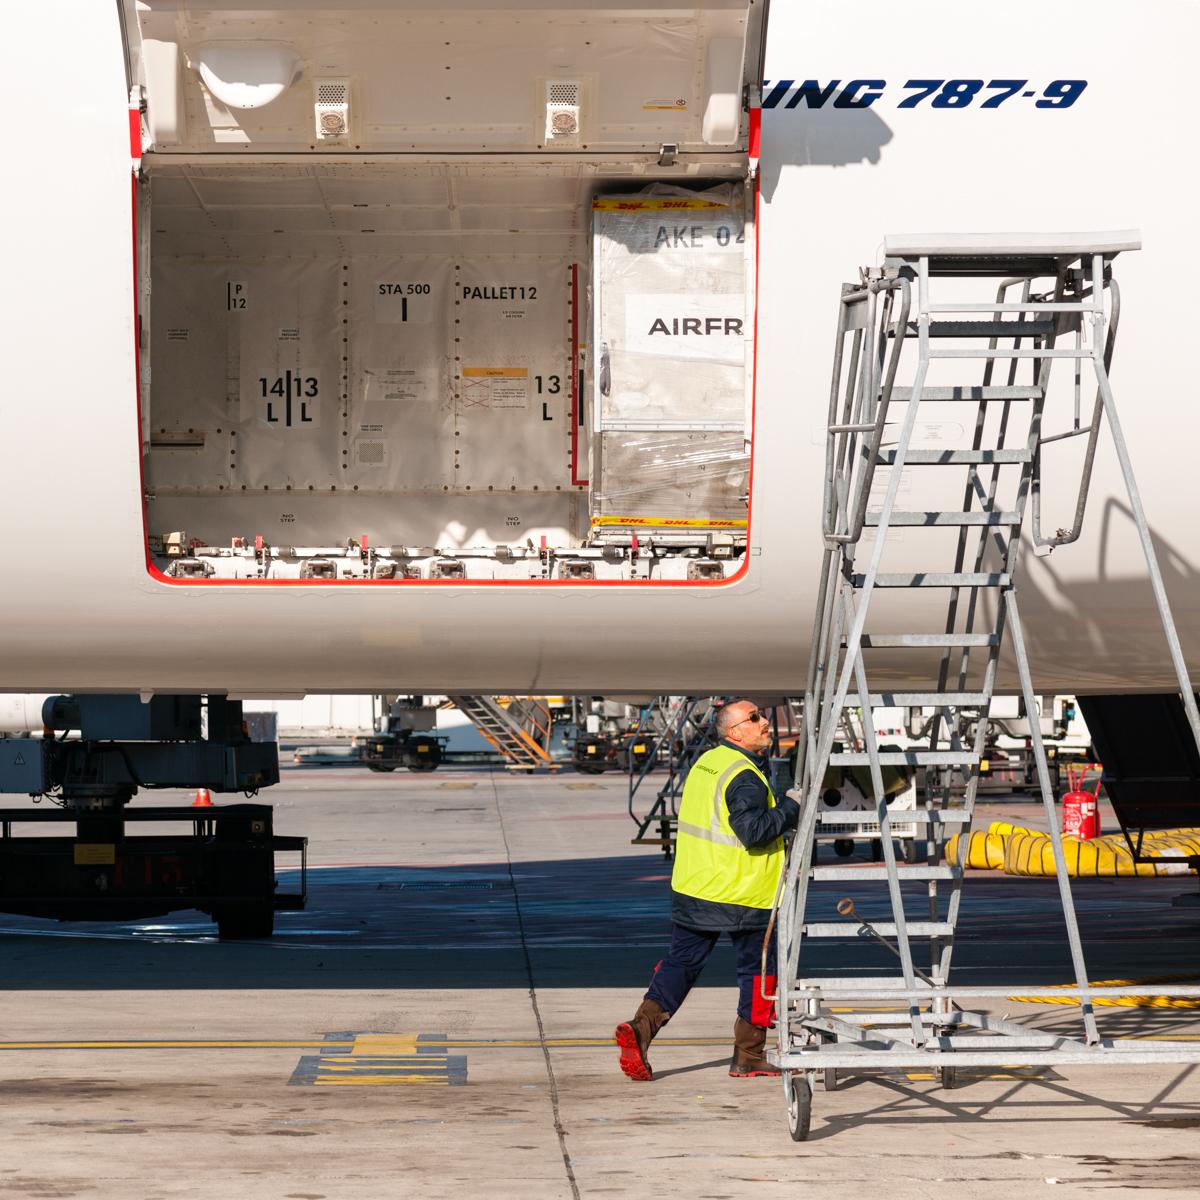 Air France at Work Ramp (2 of 5).jpg